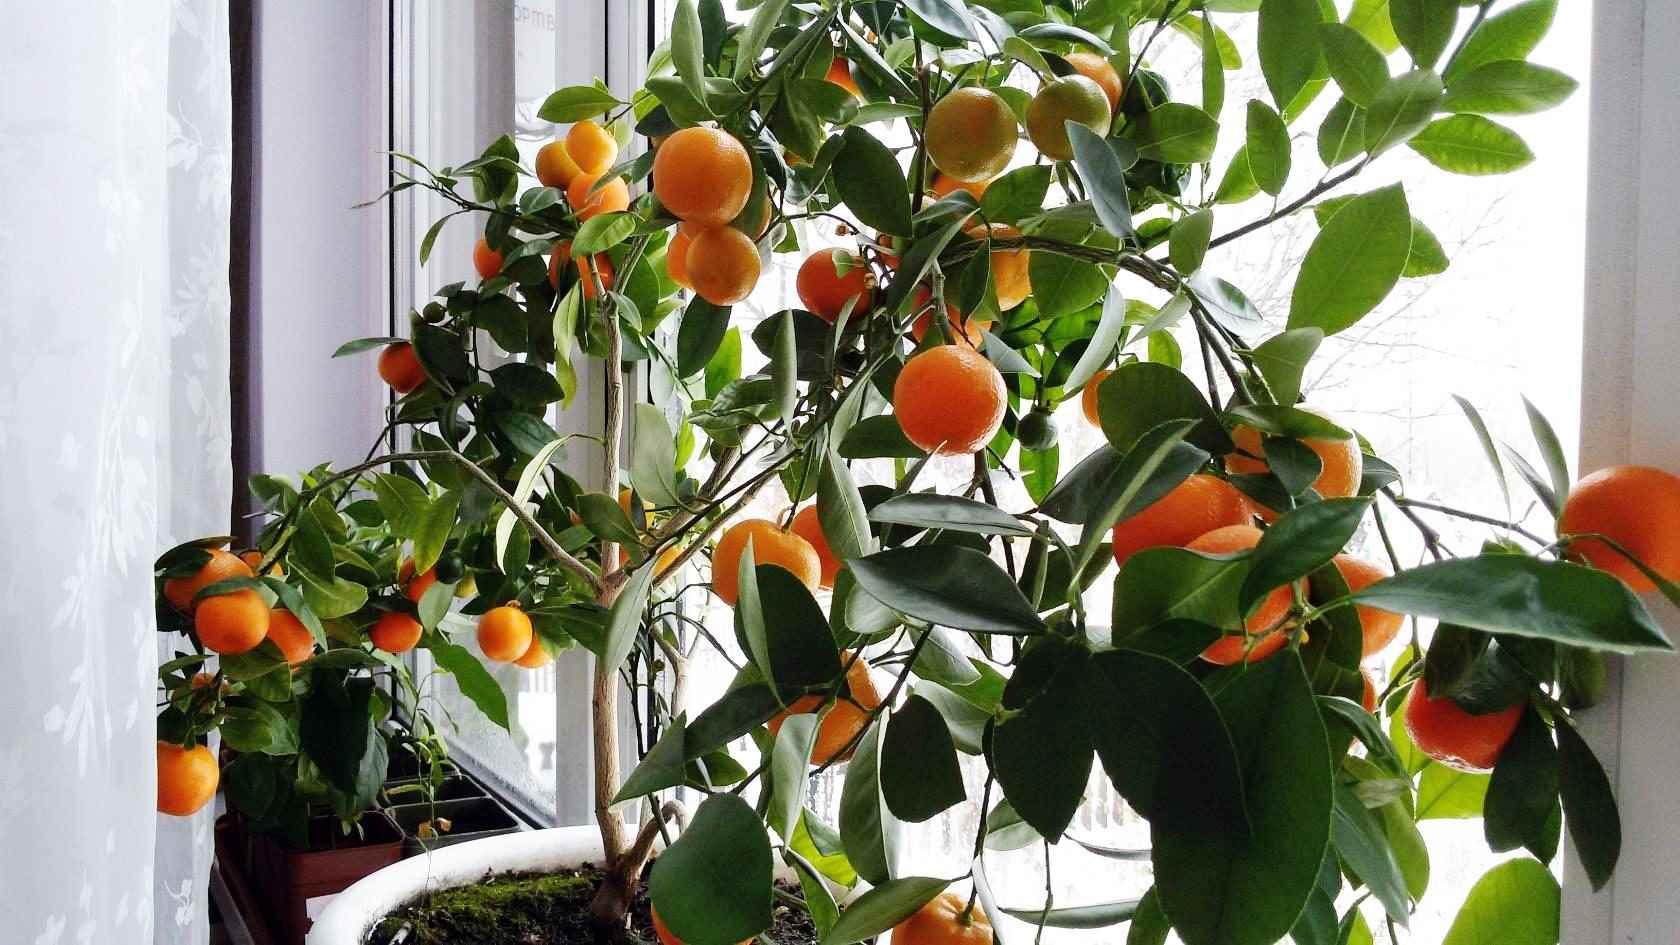 Красивое домашнее мандариновое дерево, фото и картинки 11